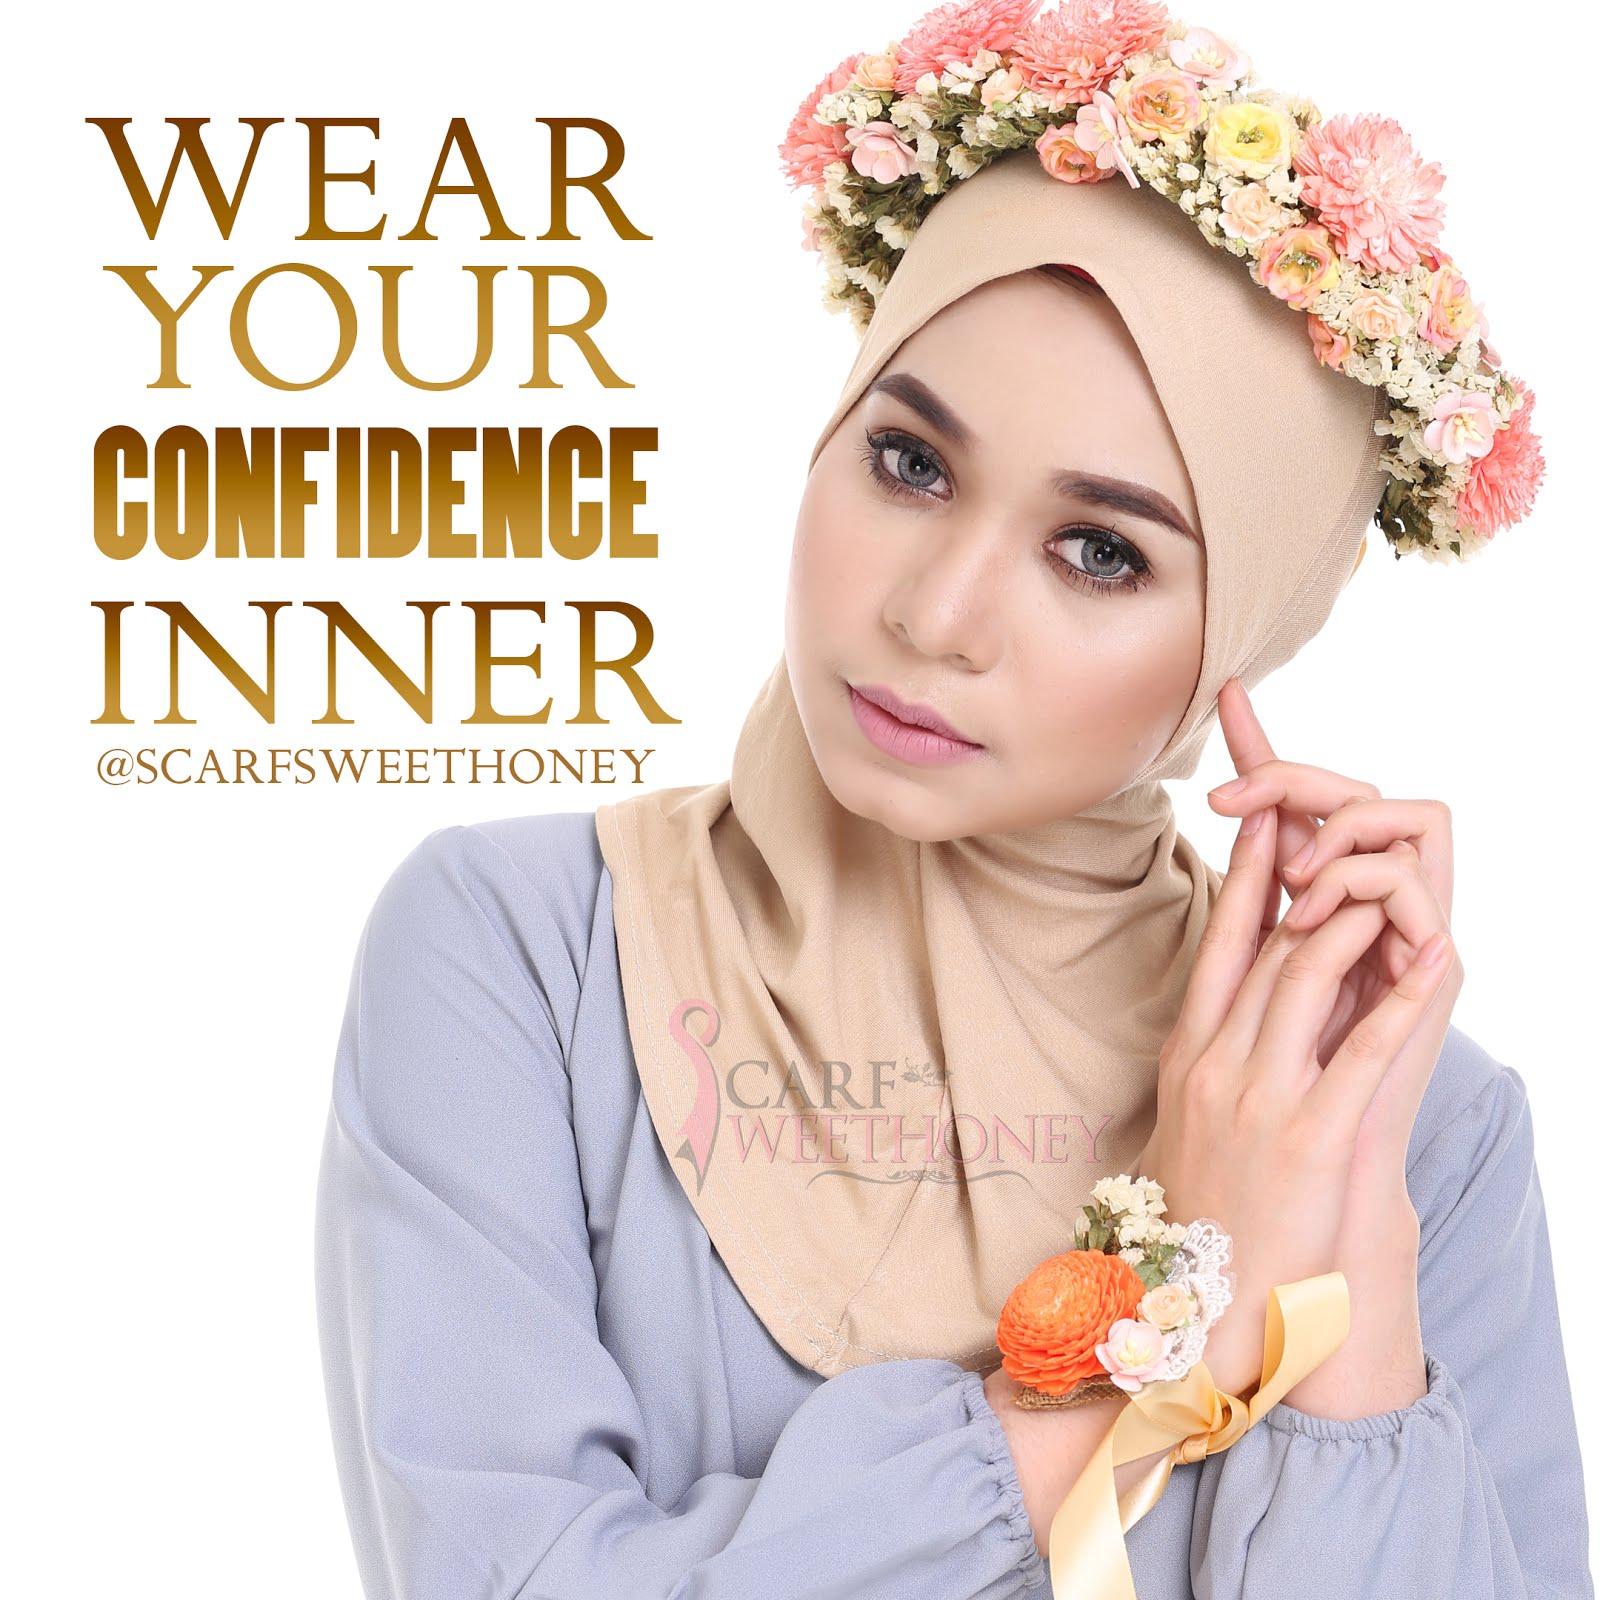 ADHWA CONFIDENCE INNER